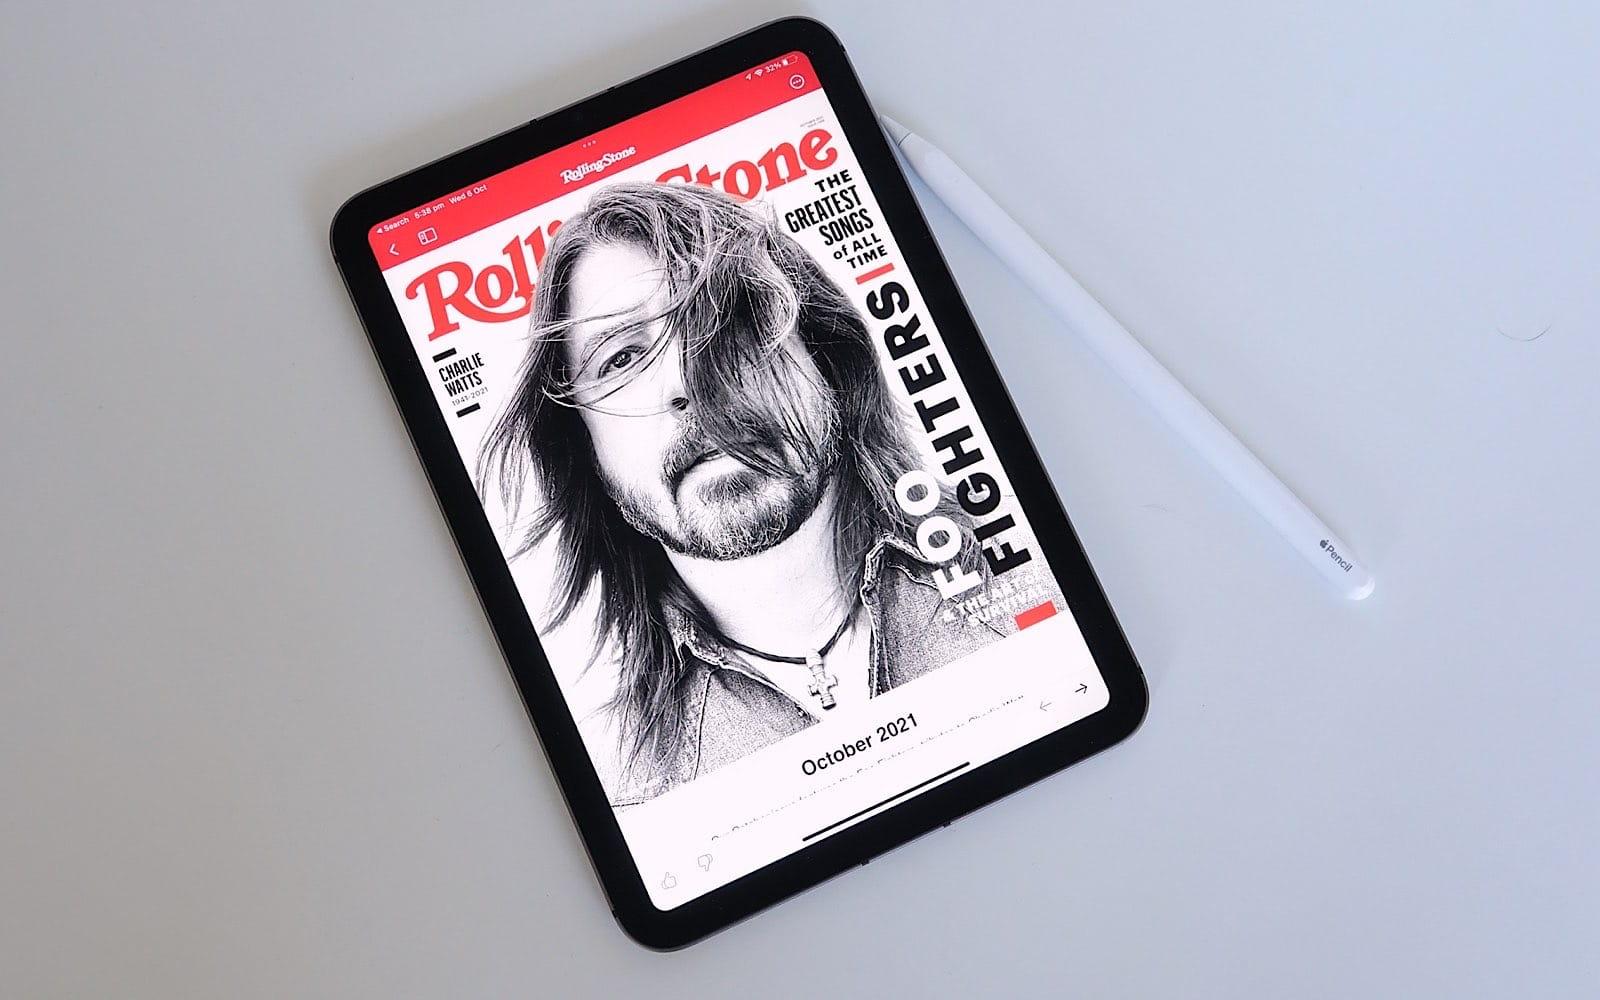 Reading Rolling Stone magazine on the iPad Mini from Apple News+.